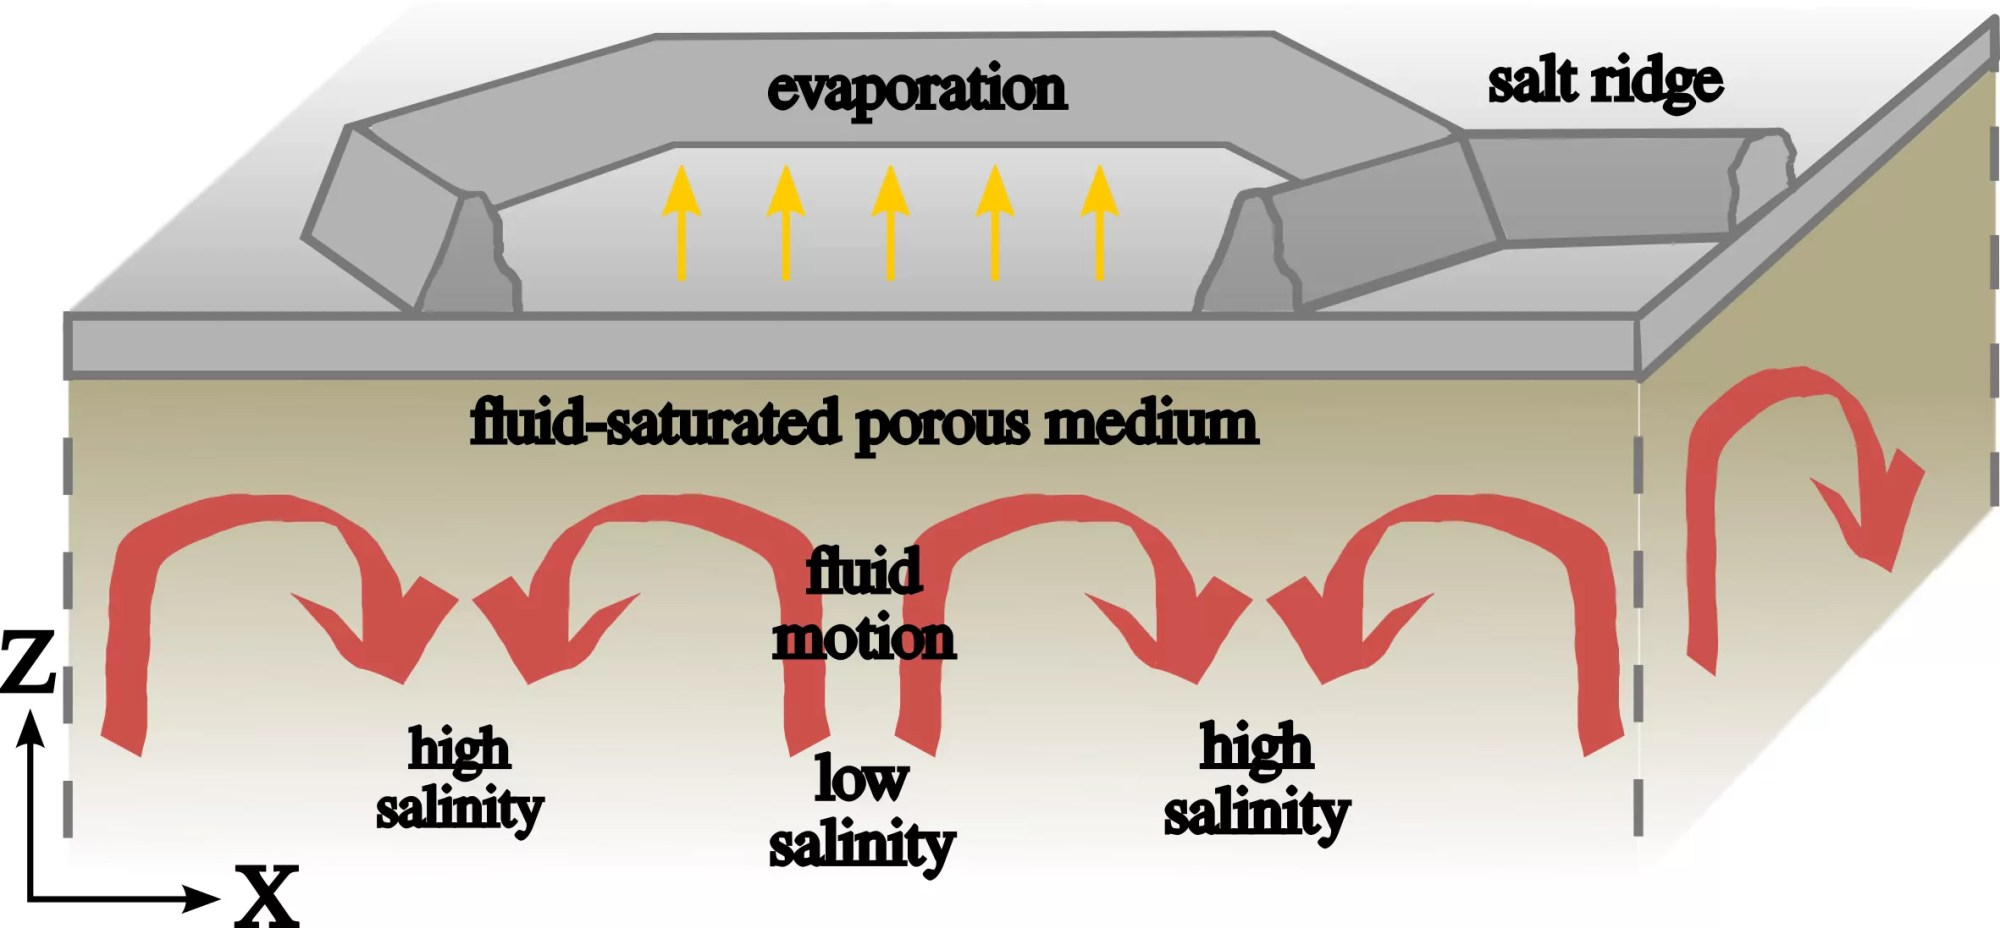 hight resolution of the convective dynamics below the salt ridge patterns illustration credit jana lasser